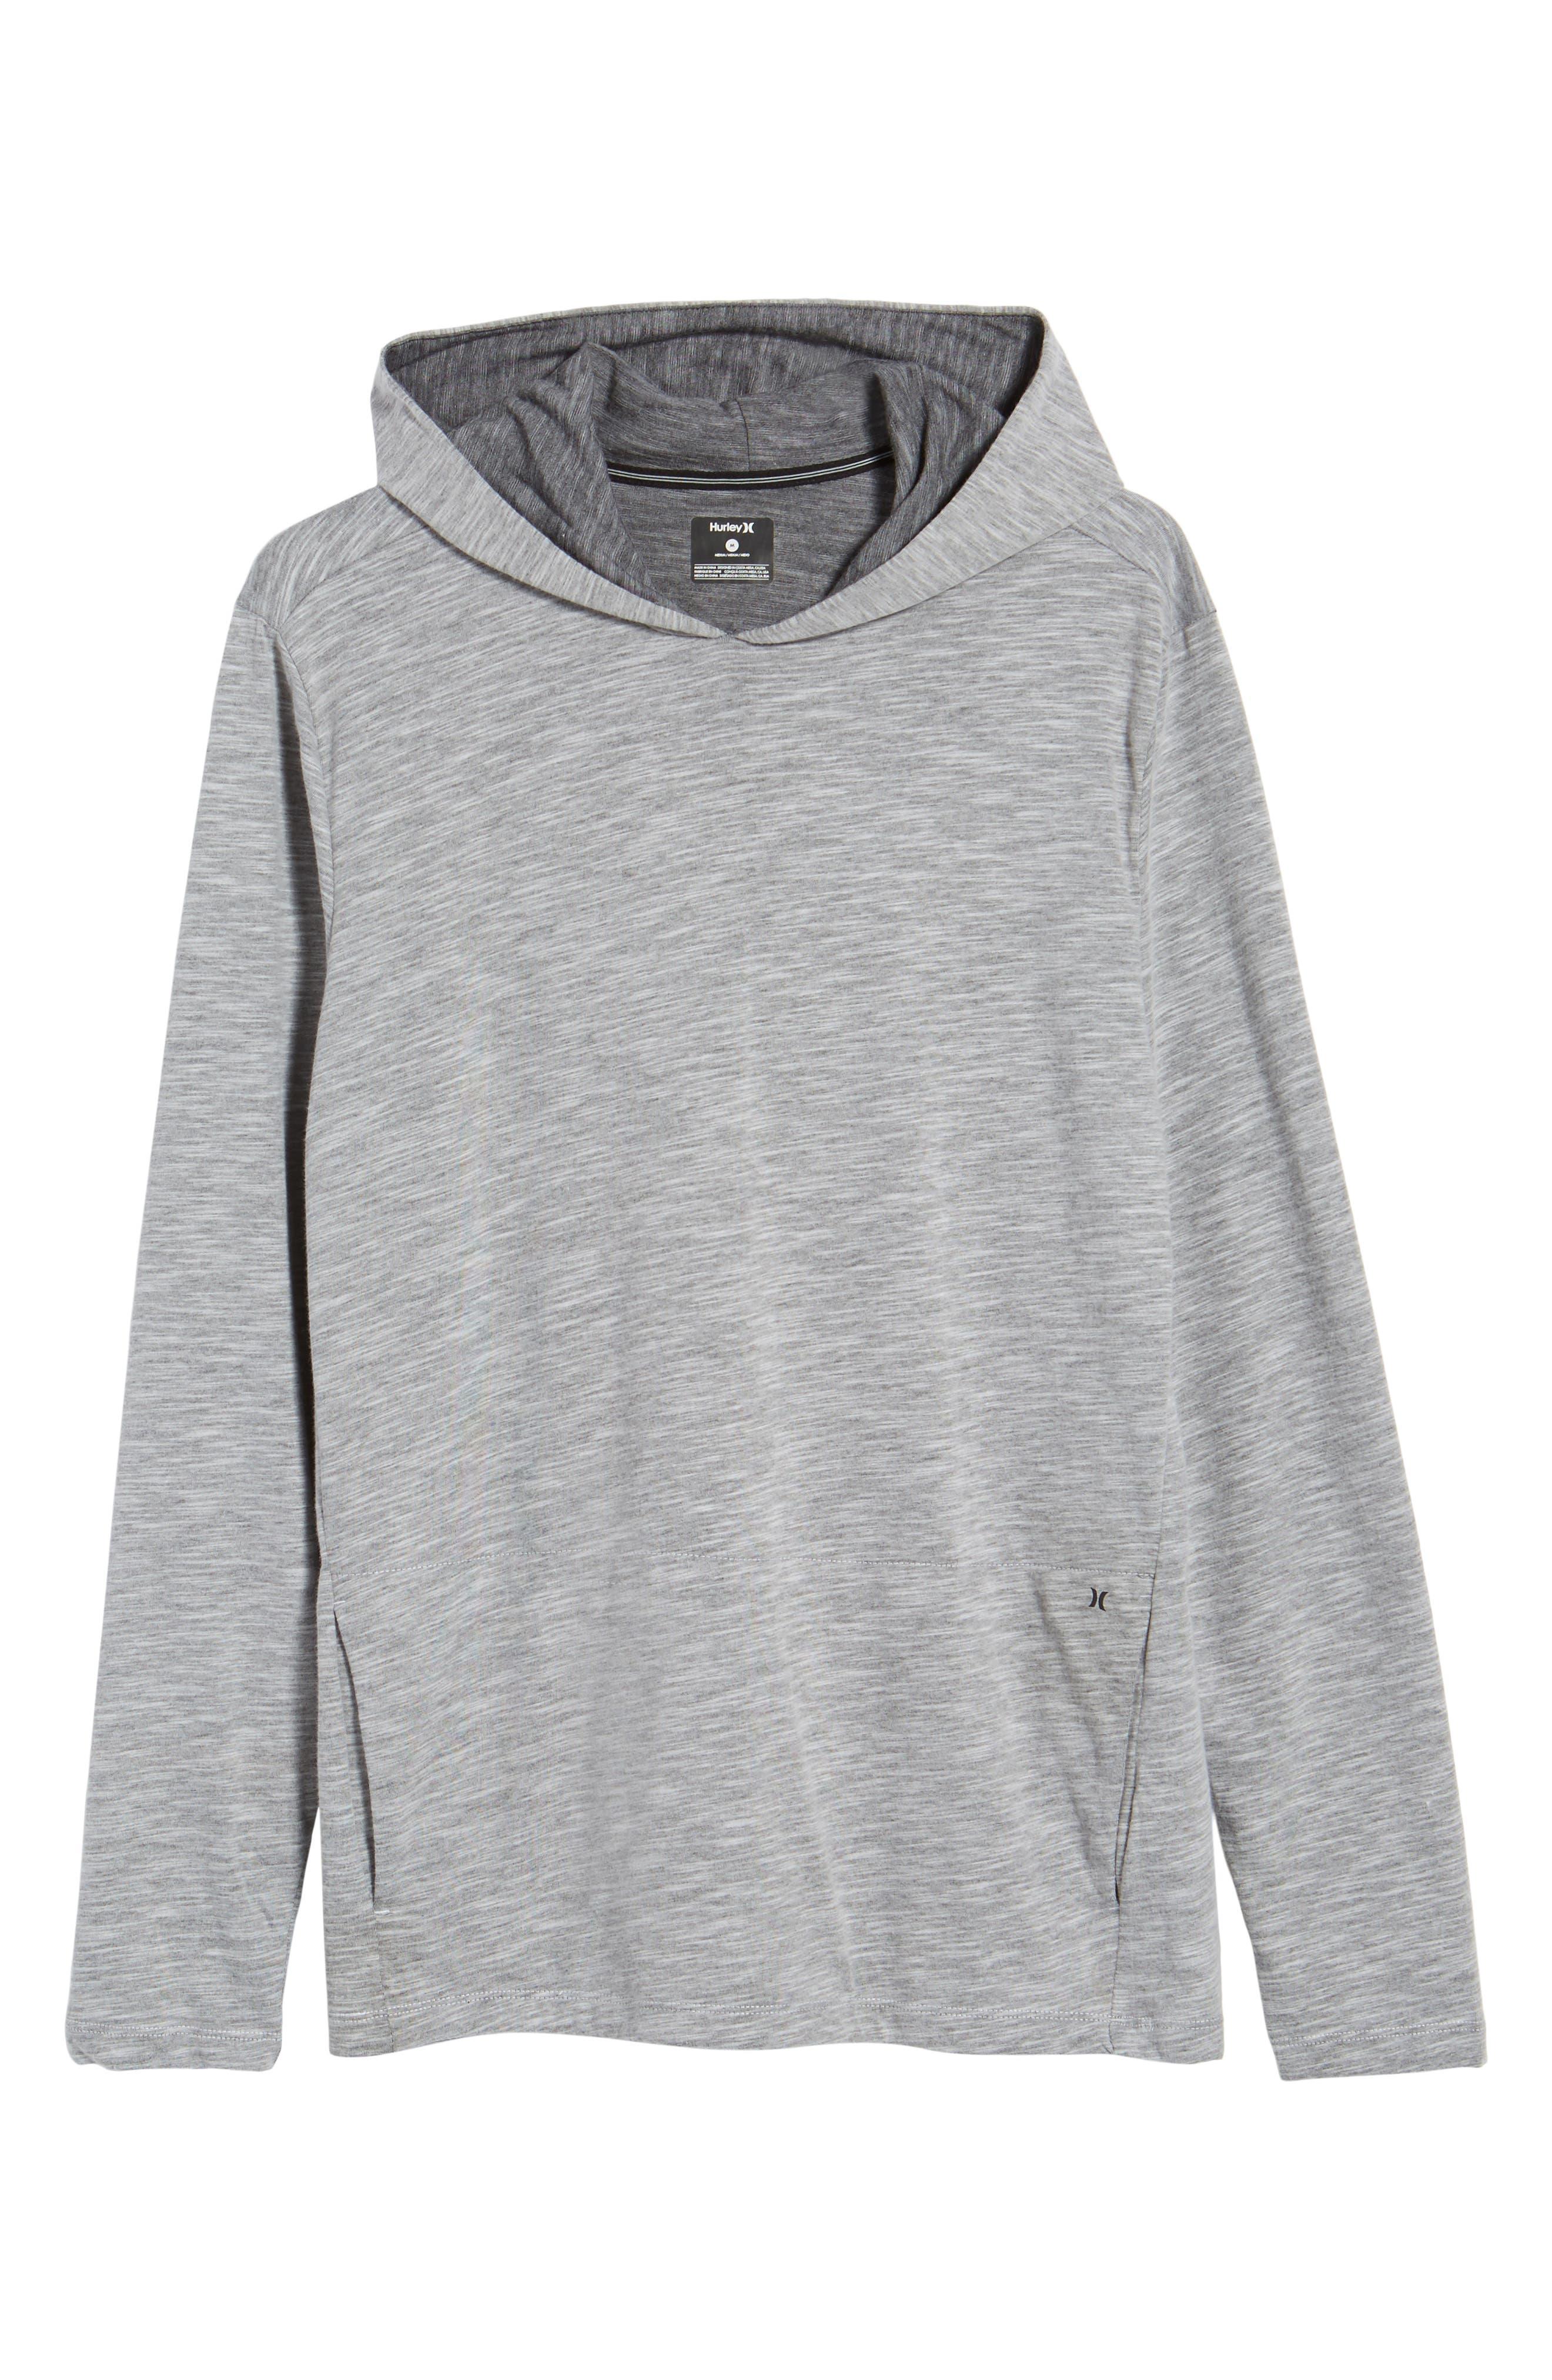 Lagos Dry Hoodie,                             Alternate thumbnail 6, color,                             Dark Grey